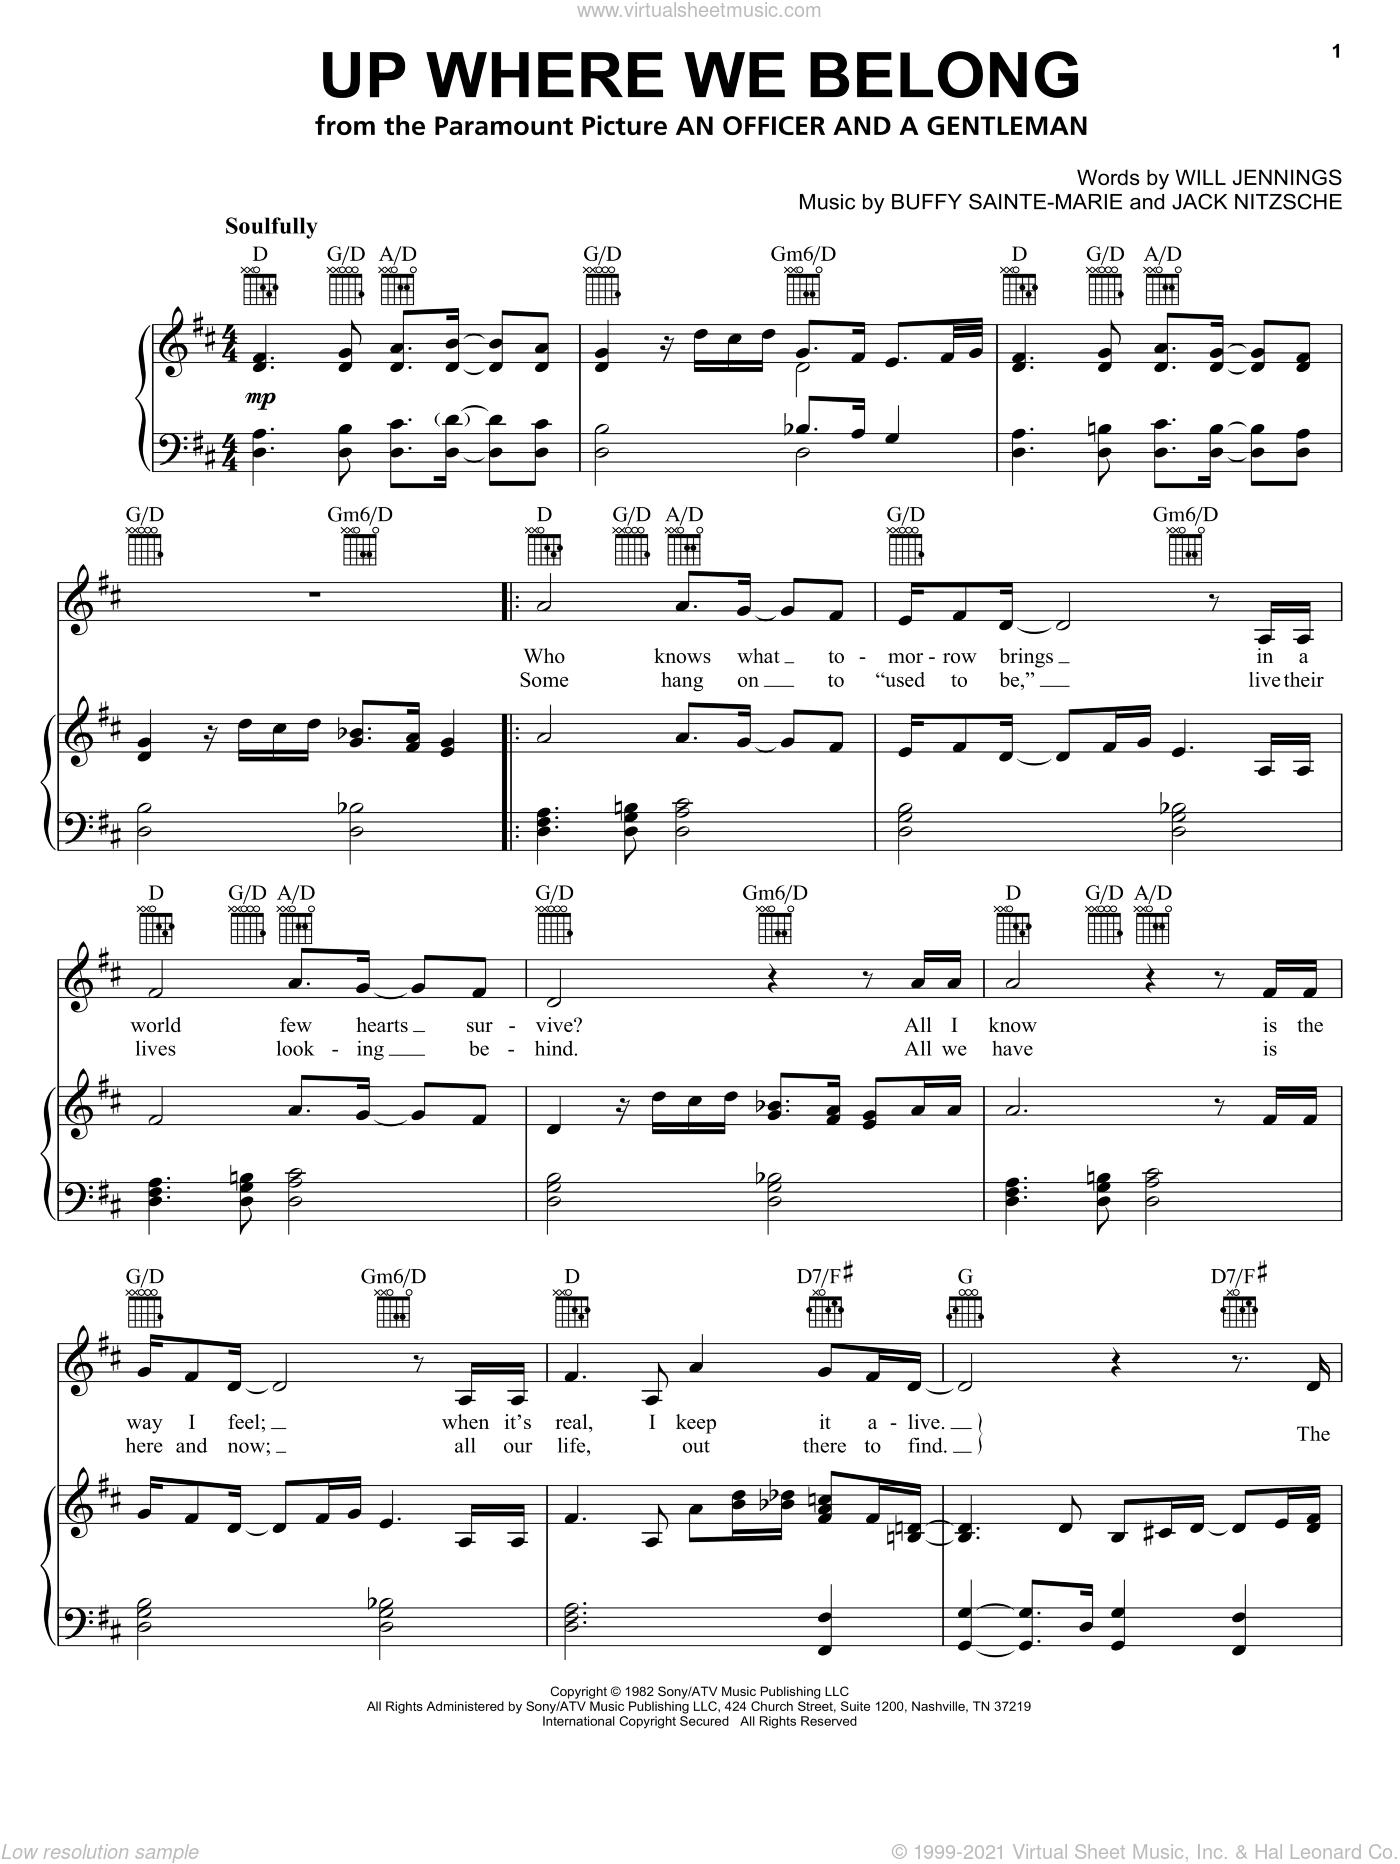 Up Where We Belong sheet music for voice, piano or guitar by Joe Cocker, BeBe & CeCe Winans, Jennifer Warnes, Buffy Sainte-Marie, Jack Nitzche and Will Jennings, intermediate skill level